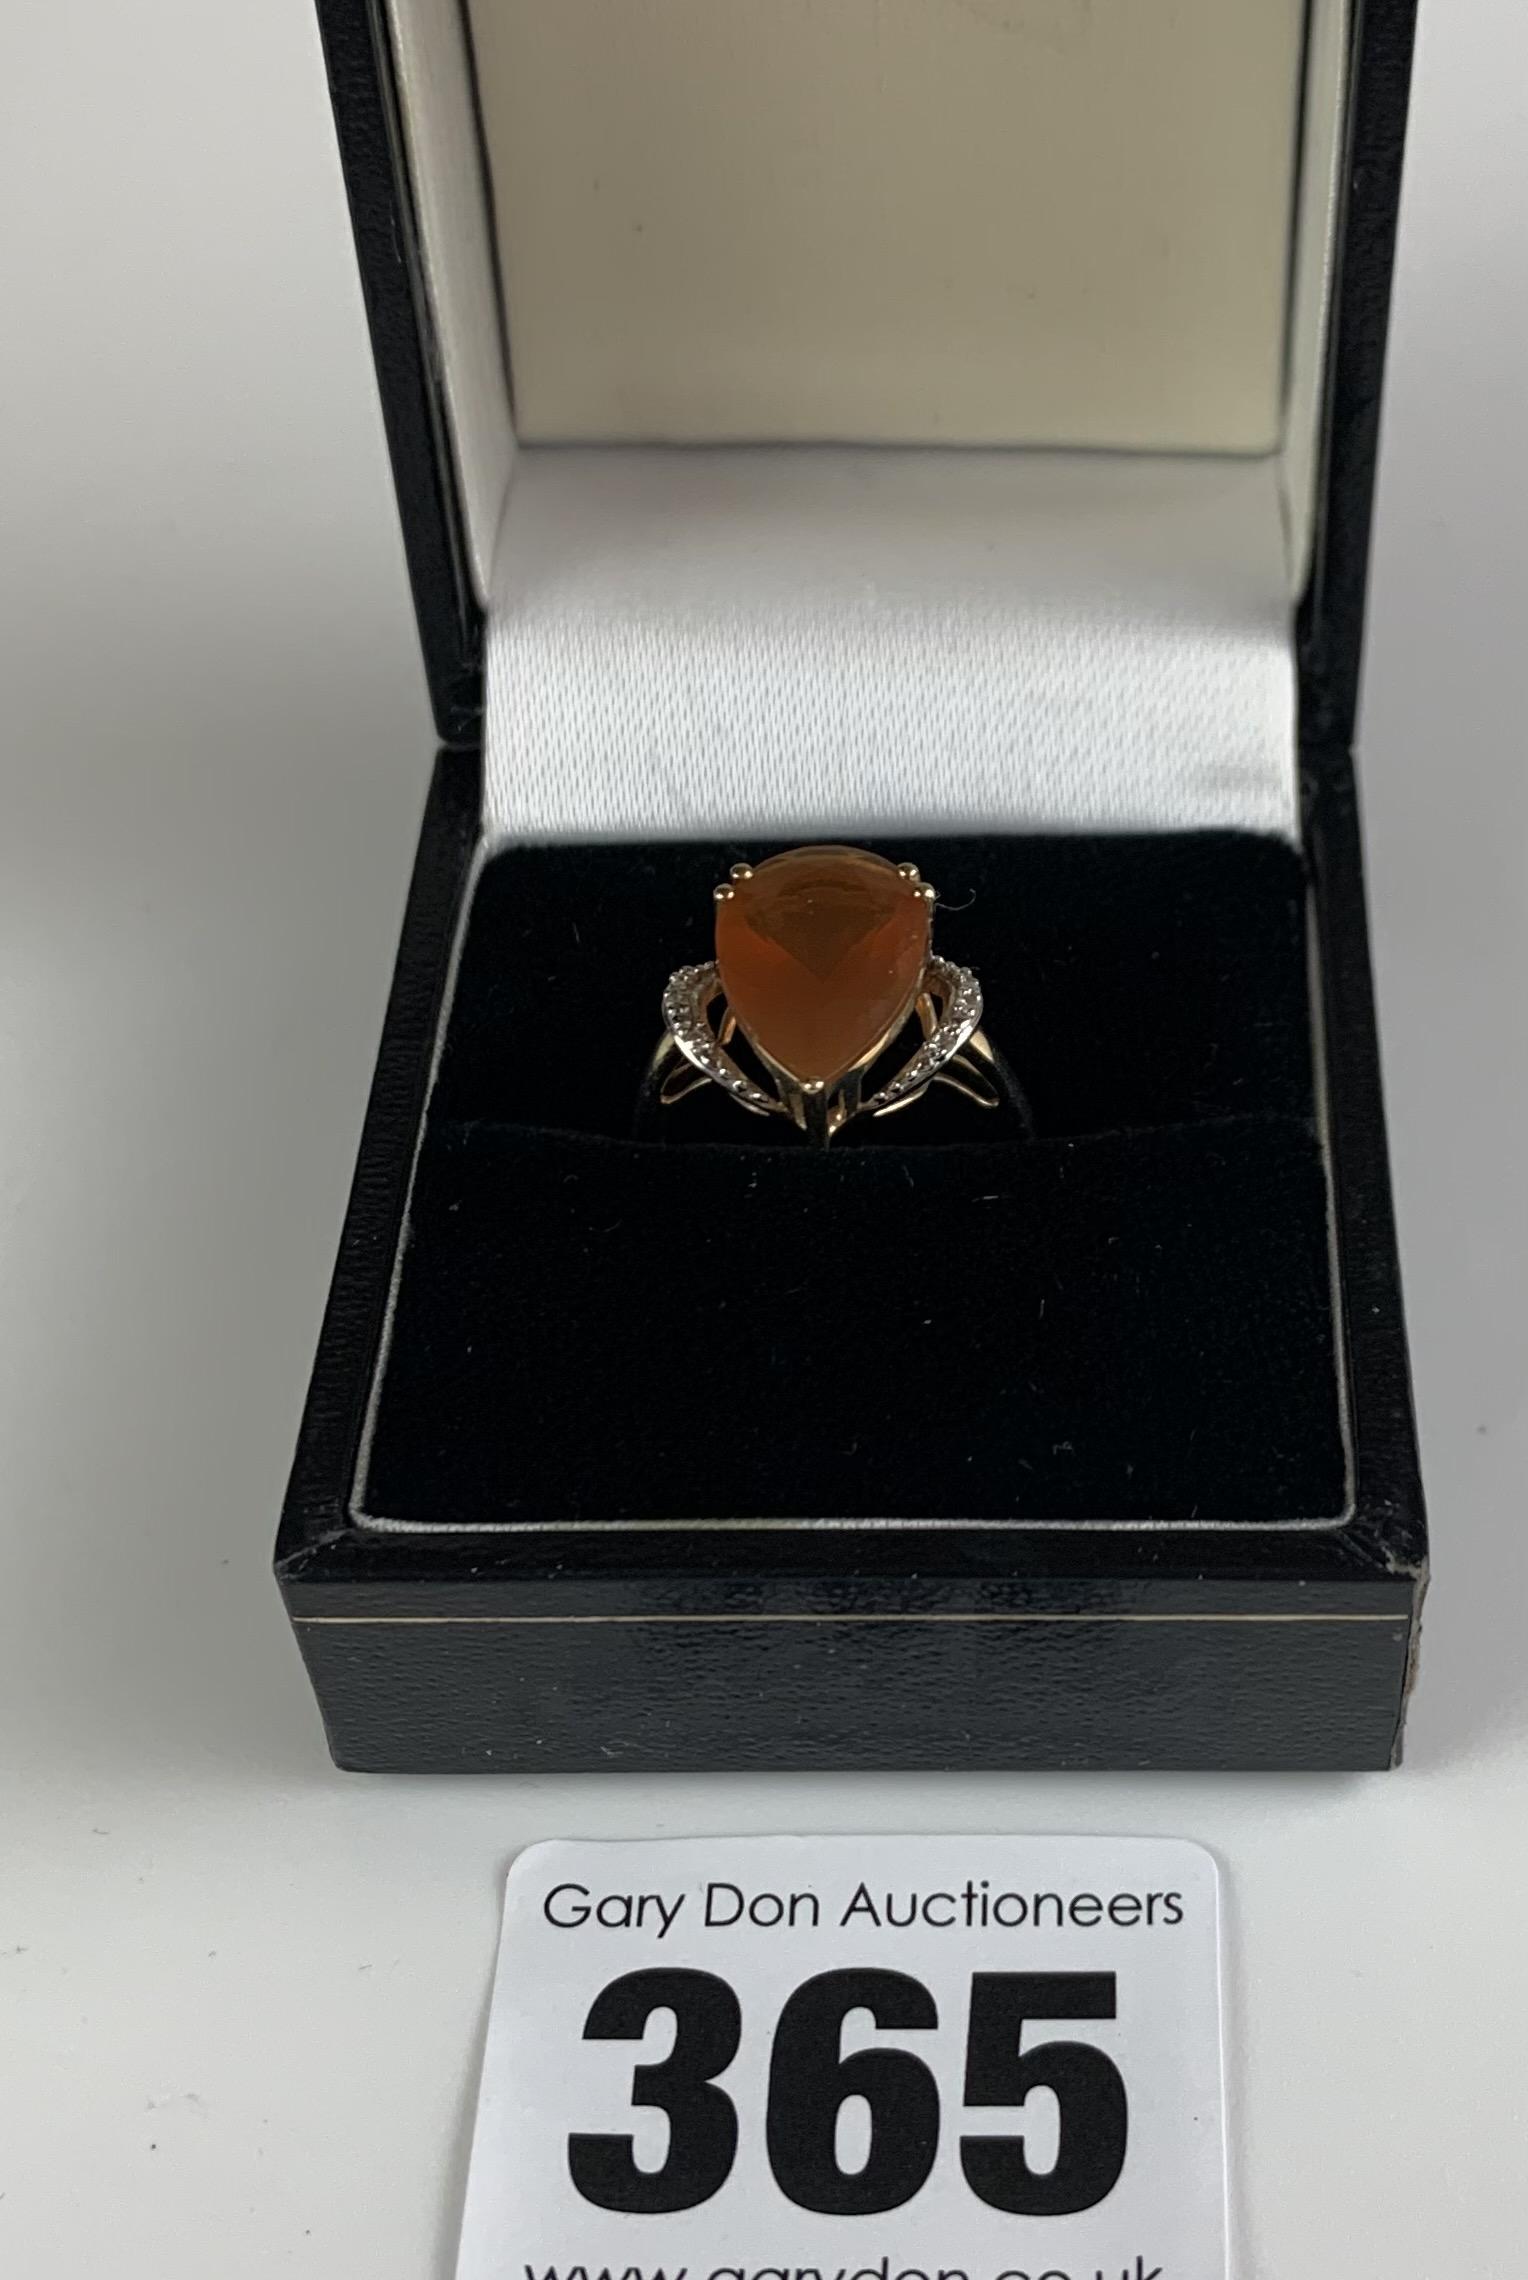 10k gold ring with heart shaped orange stone, size J/K, w: 2.1 gms - Image 2 of 6